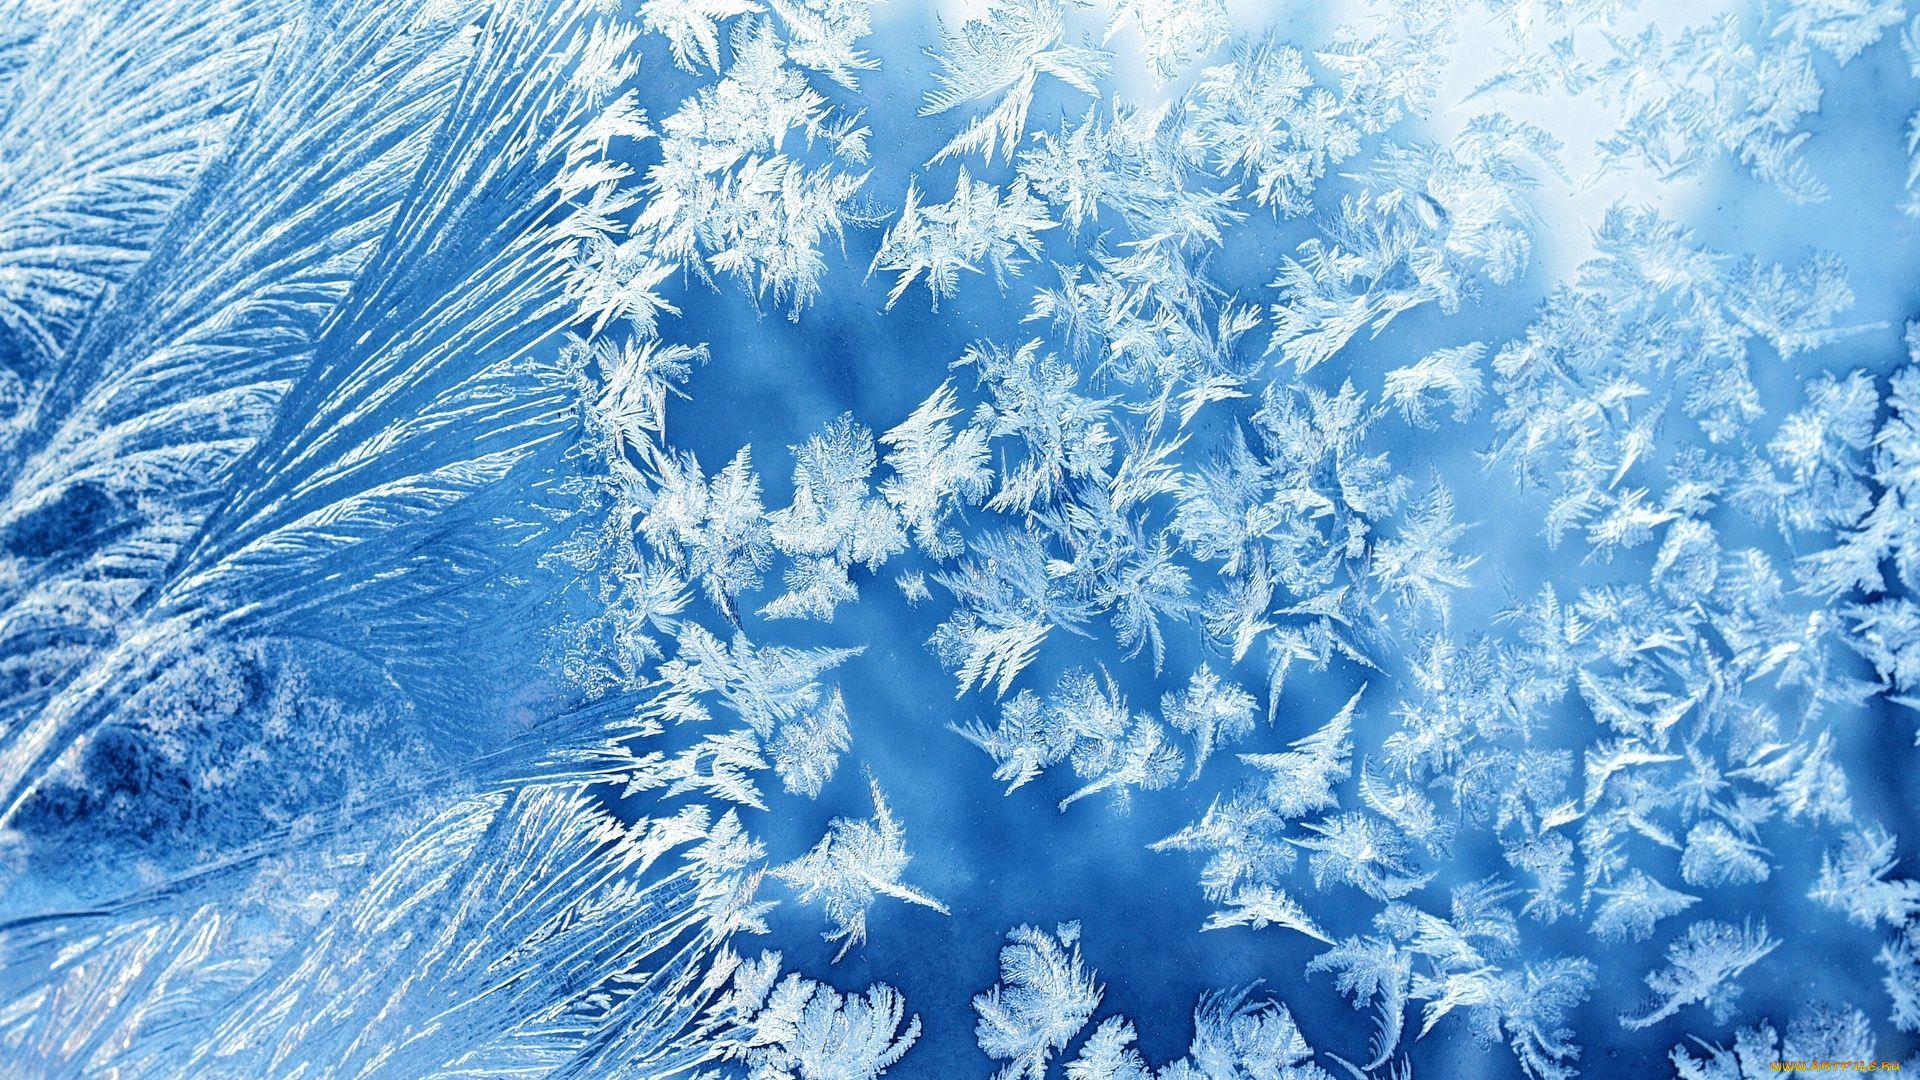 Winter Patterns On The Window wallpaper image hd